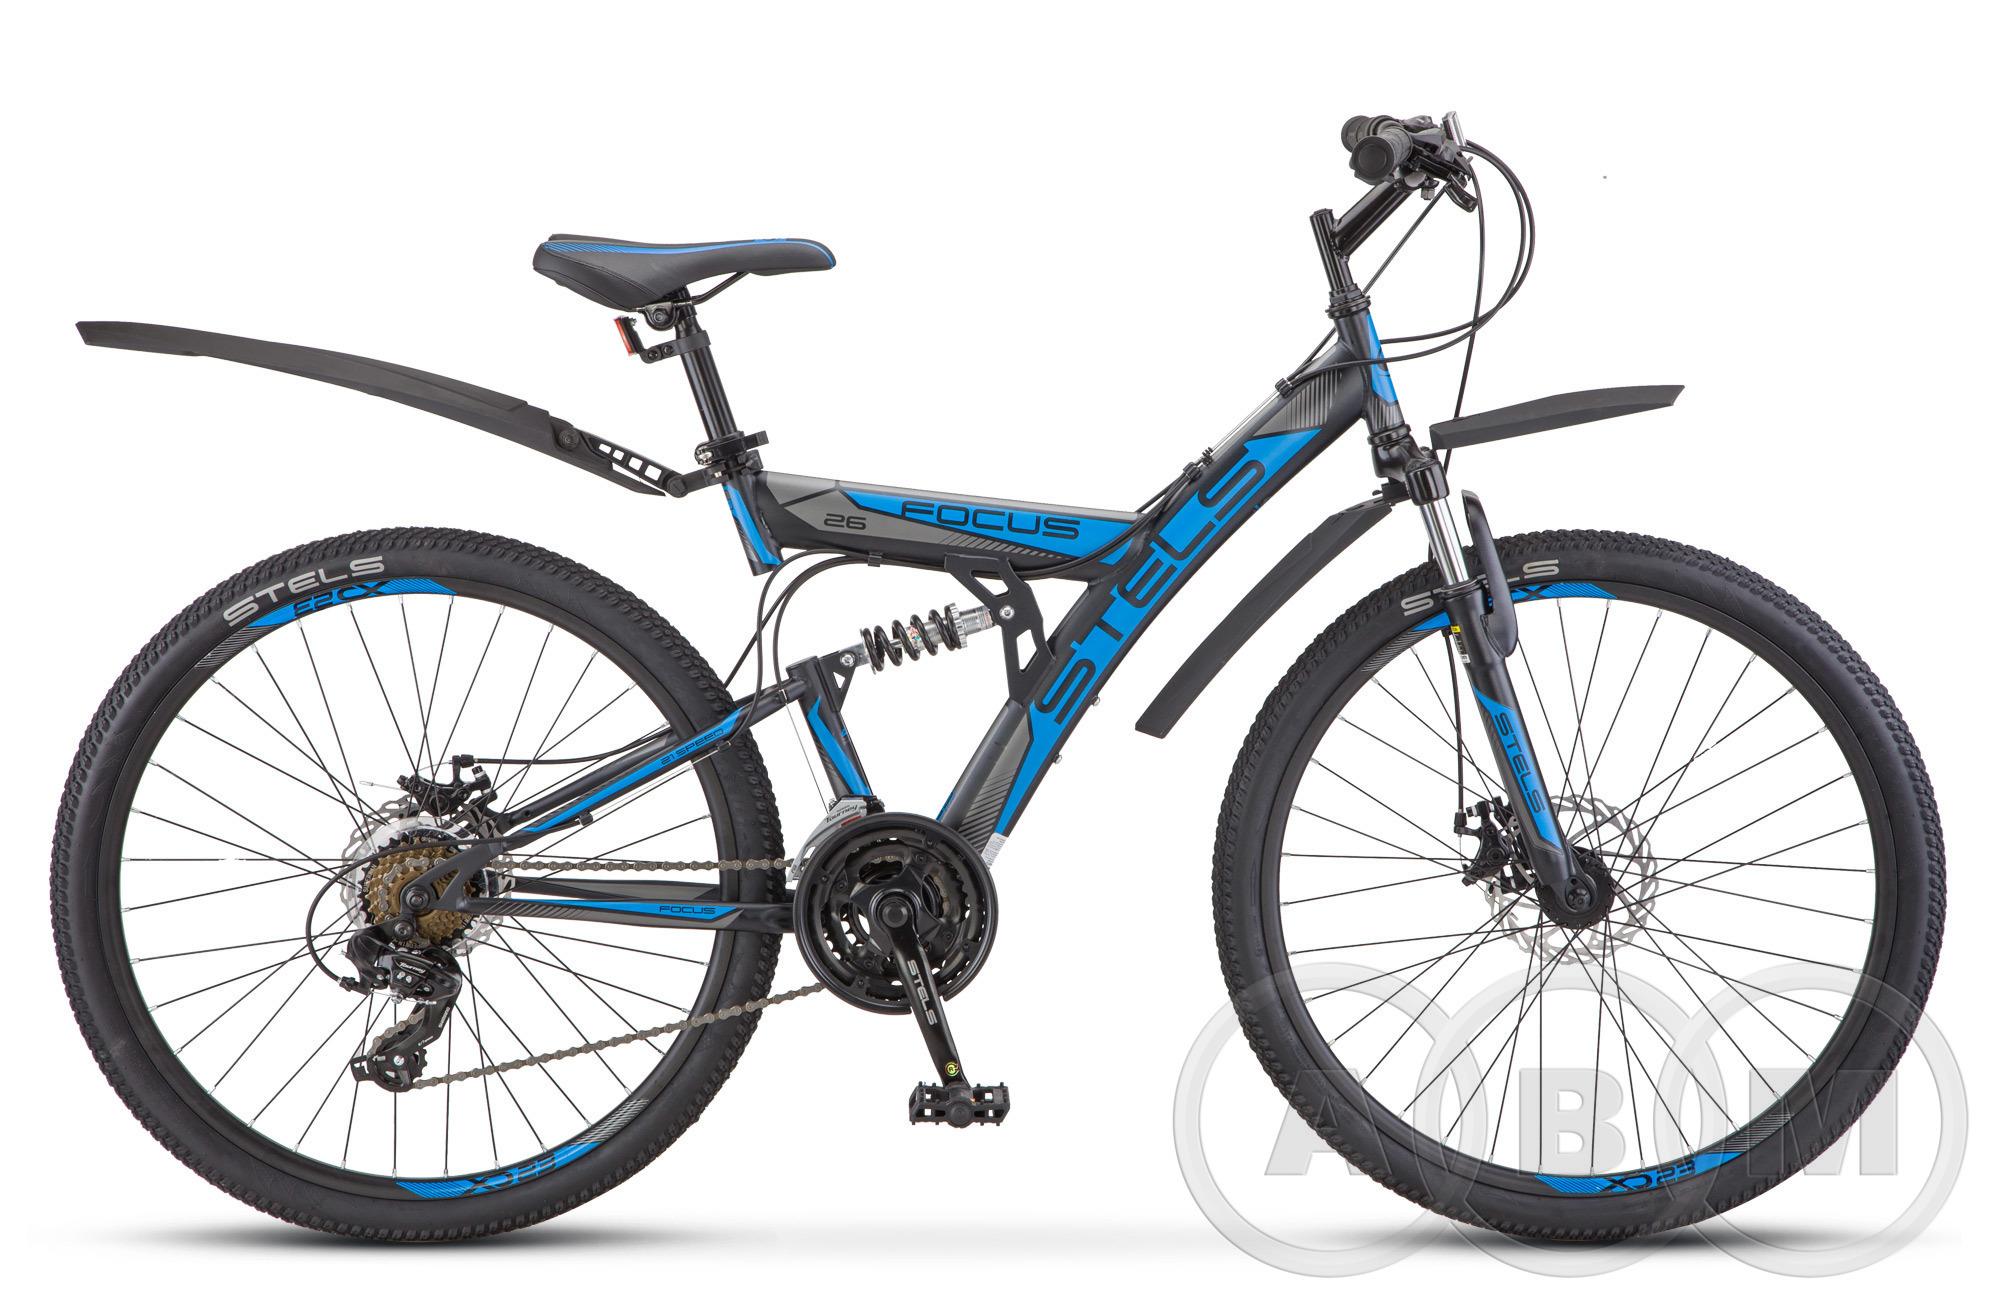 26 Велосипед Stels Focus MD 21 ск